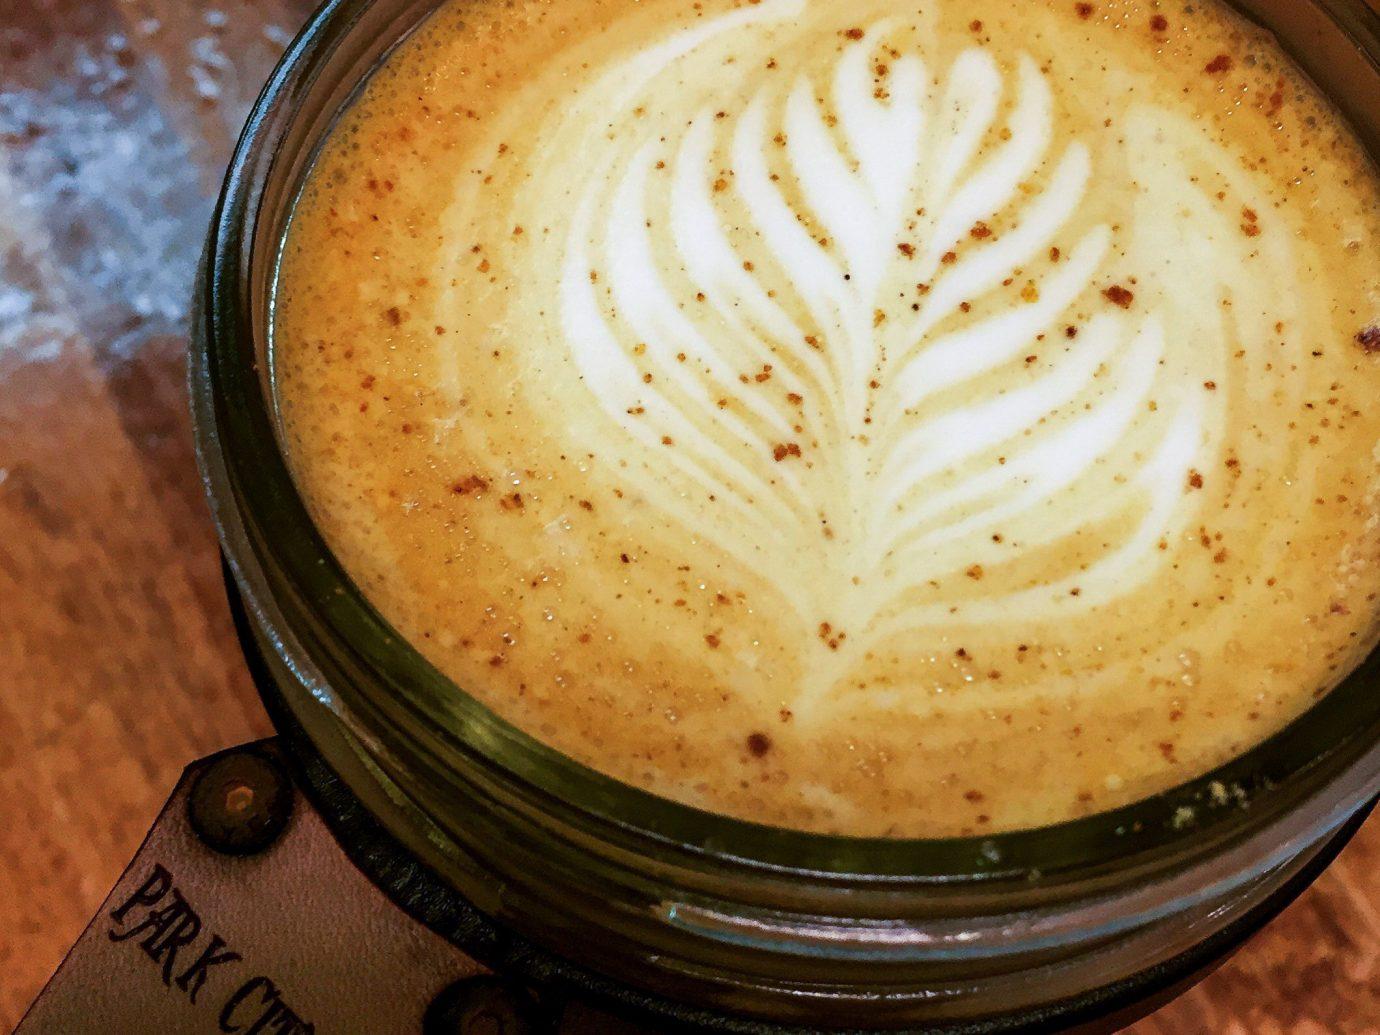 Trip Ideas cup indoor coffee latte beverage flat white food cappuccino café au lait Drink mocaccino cuban espresso coffee cup flavor coffee milk cortado caffeine caffè macchiato